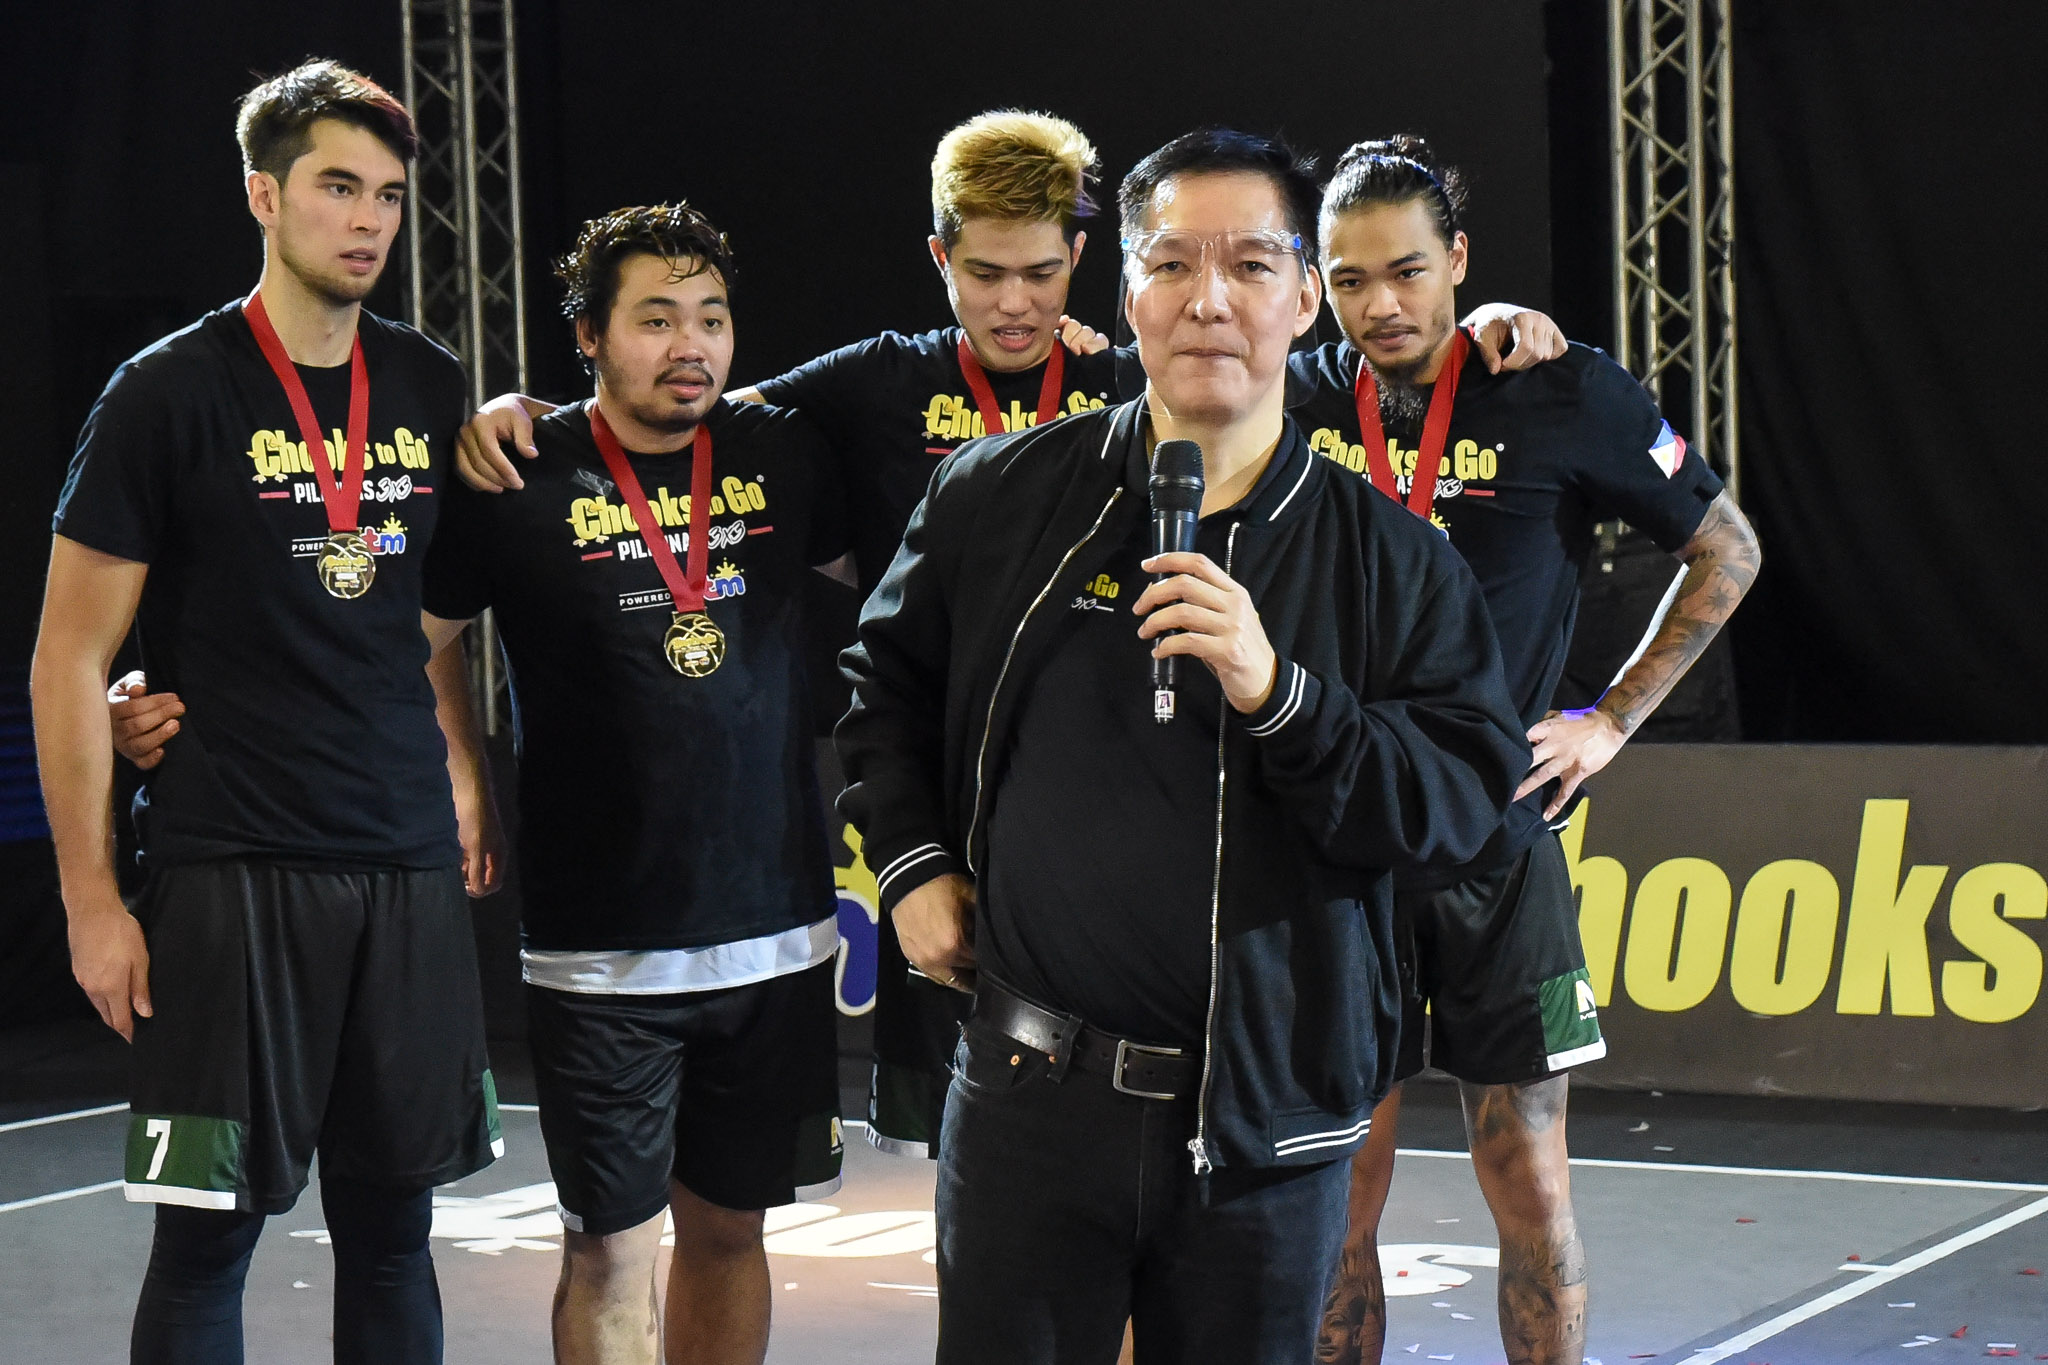 Chooks-to-Go-Pilipinas-3X3-Coach-Eric-Altamirano-2-1 Best of 2020: Munzon, Pasaol, Rike, and Santillan close Chooks 3x3's first chapter 3x3 Basketball Bandwagon Wire Chooks-to-Go Pilipinas 3x3  - philippine sports news